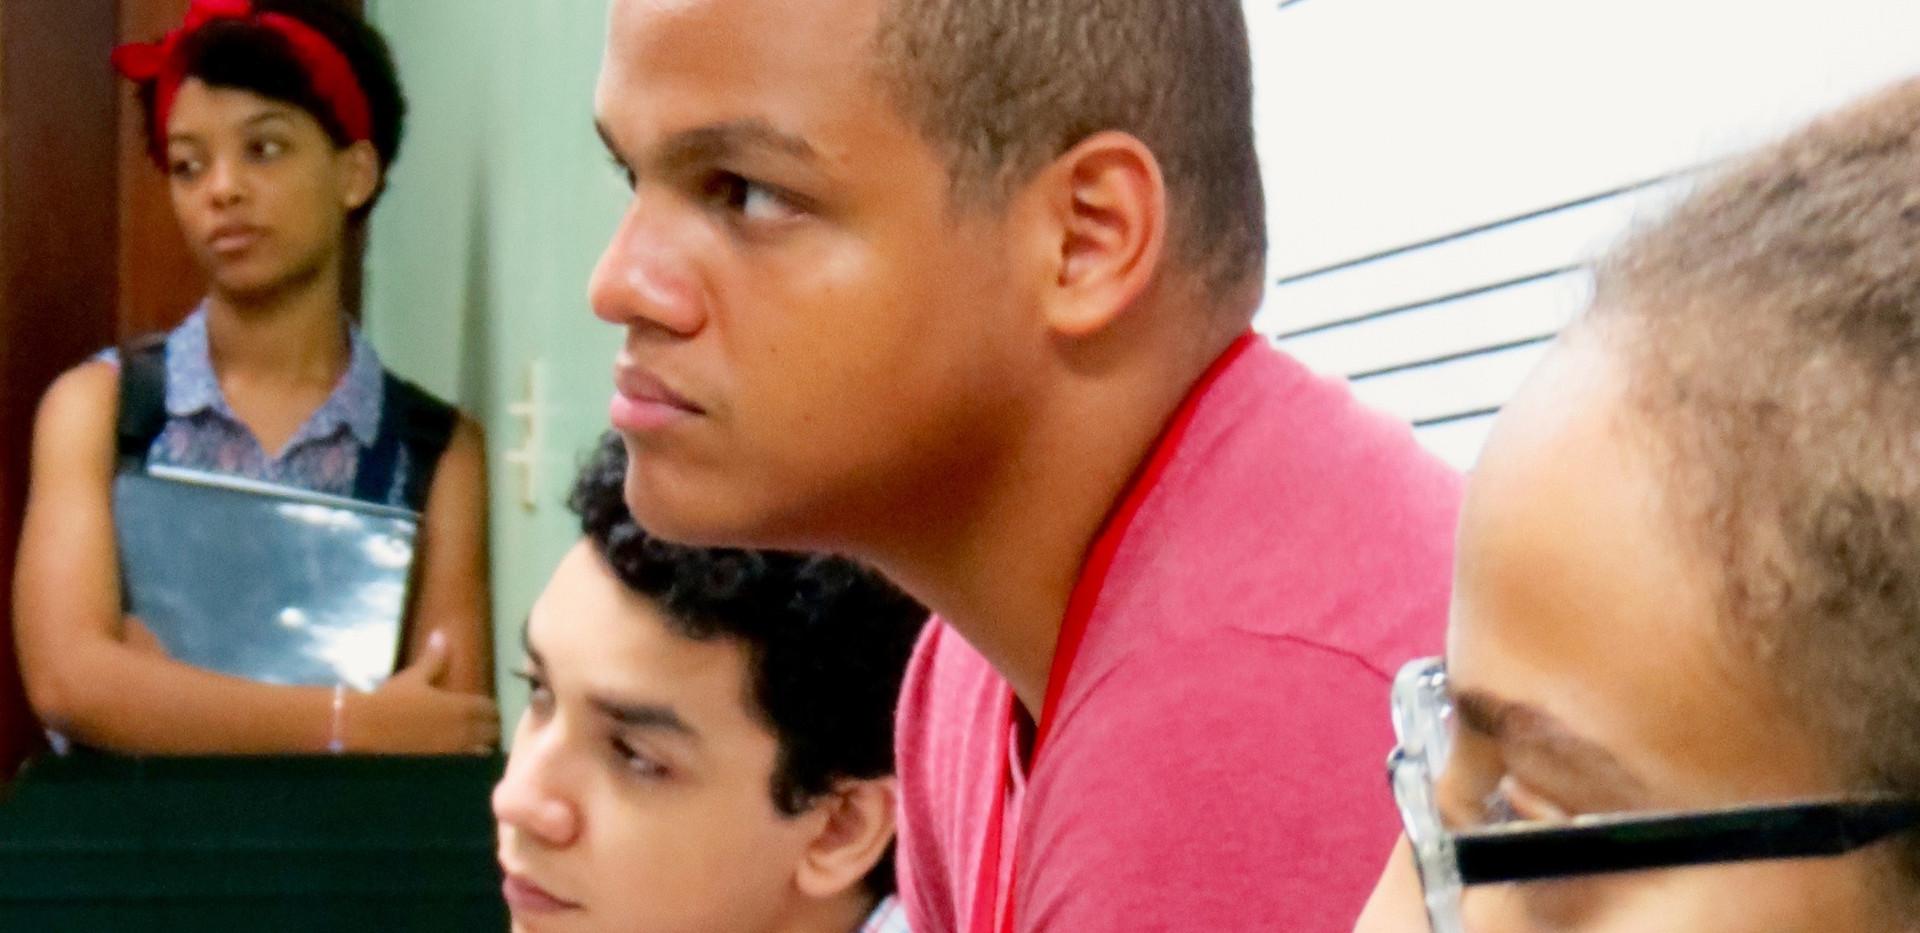 Students listening to Guy's teaching.jpg